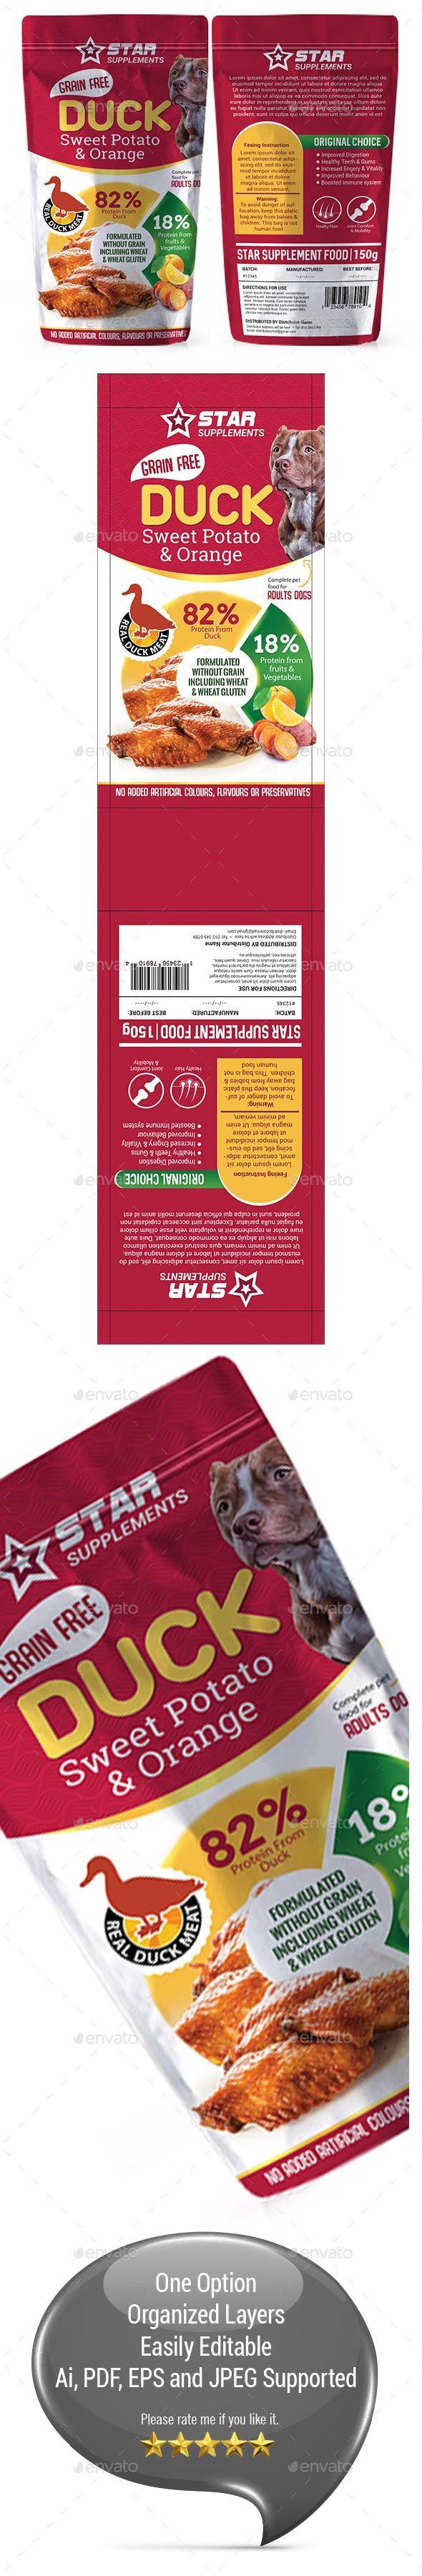 Download Dog Food Supplement Packaging Template 07 Packaging Template Packaging Template Design Dog Food Supplement